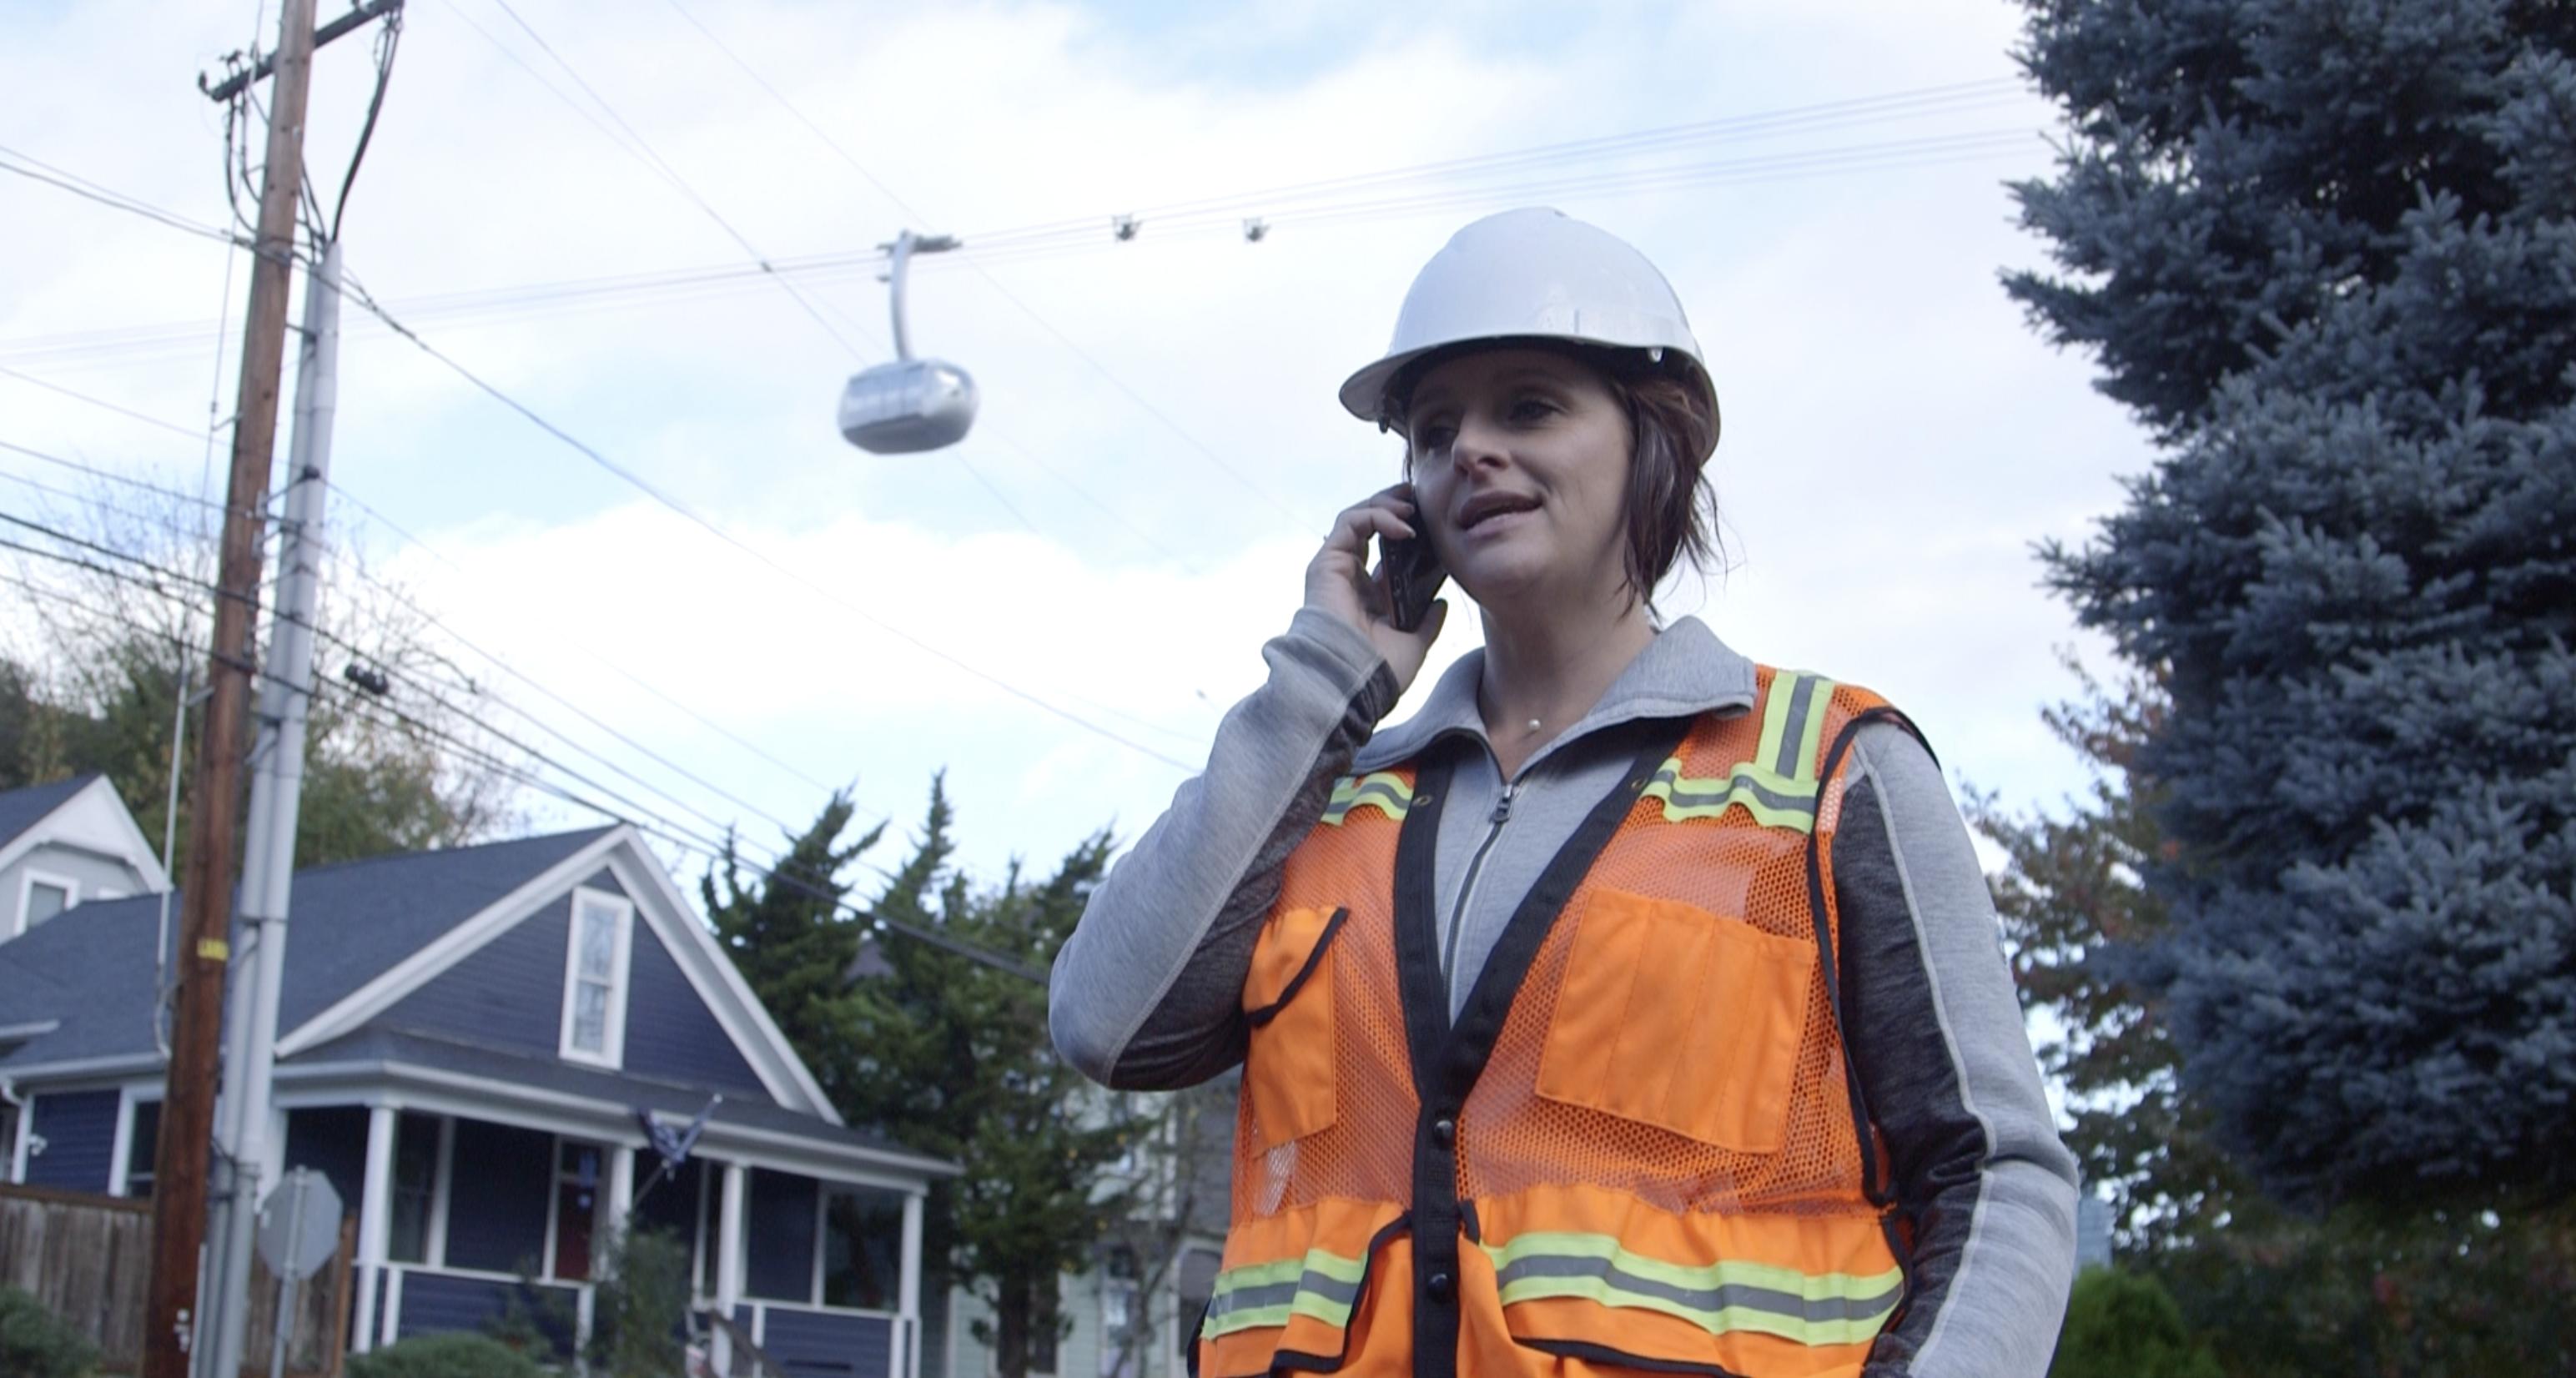 Excavation Safety 101 Online Course | Oregon 811 in Portland OR